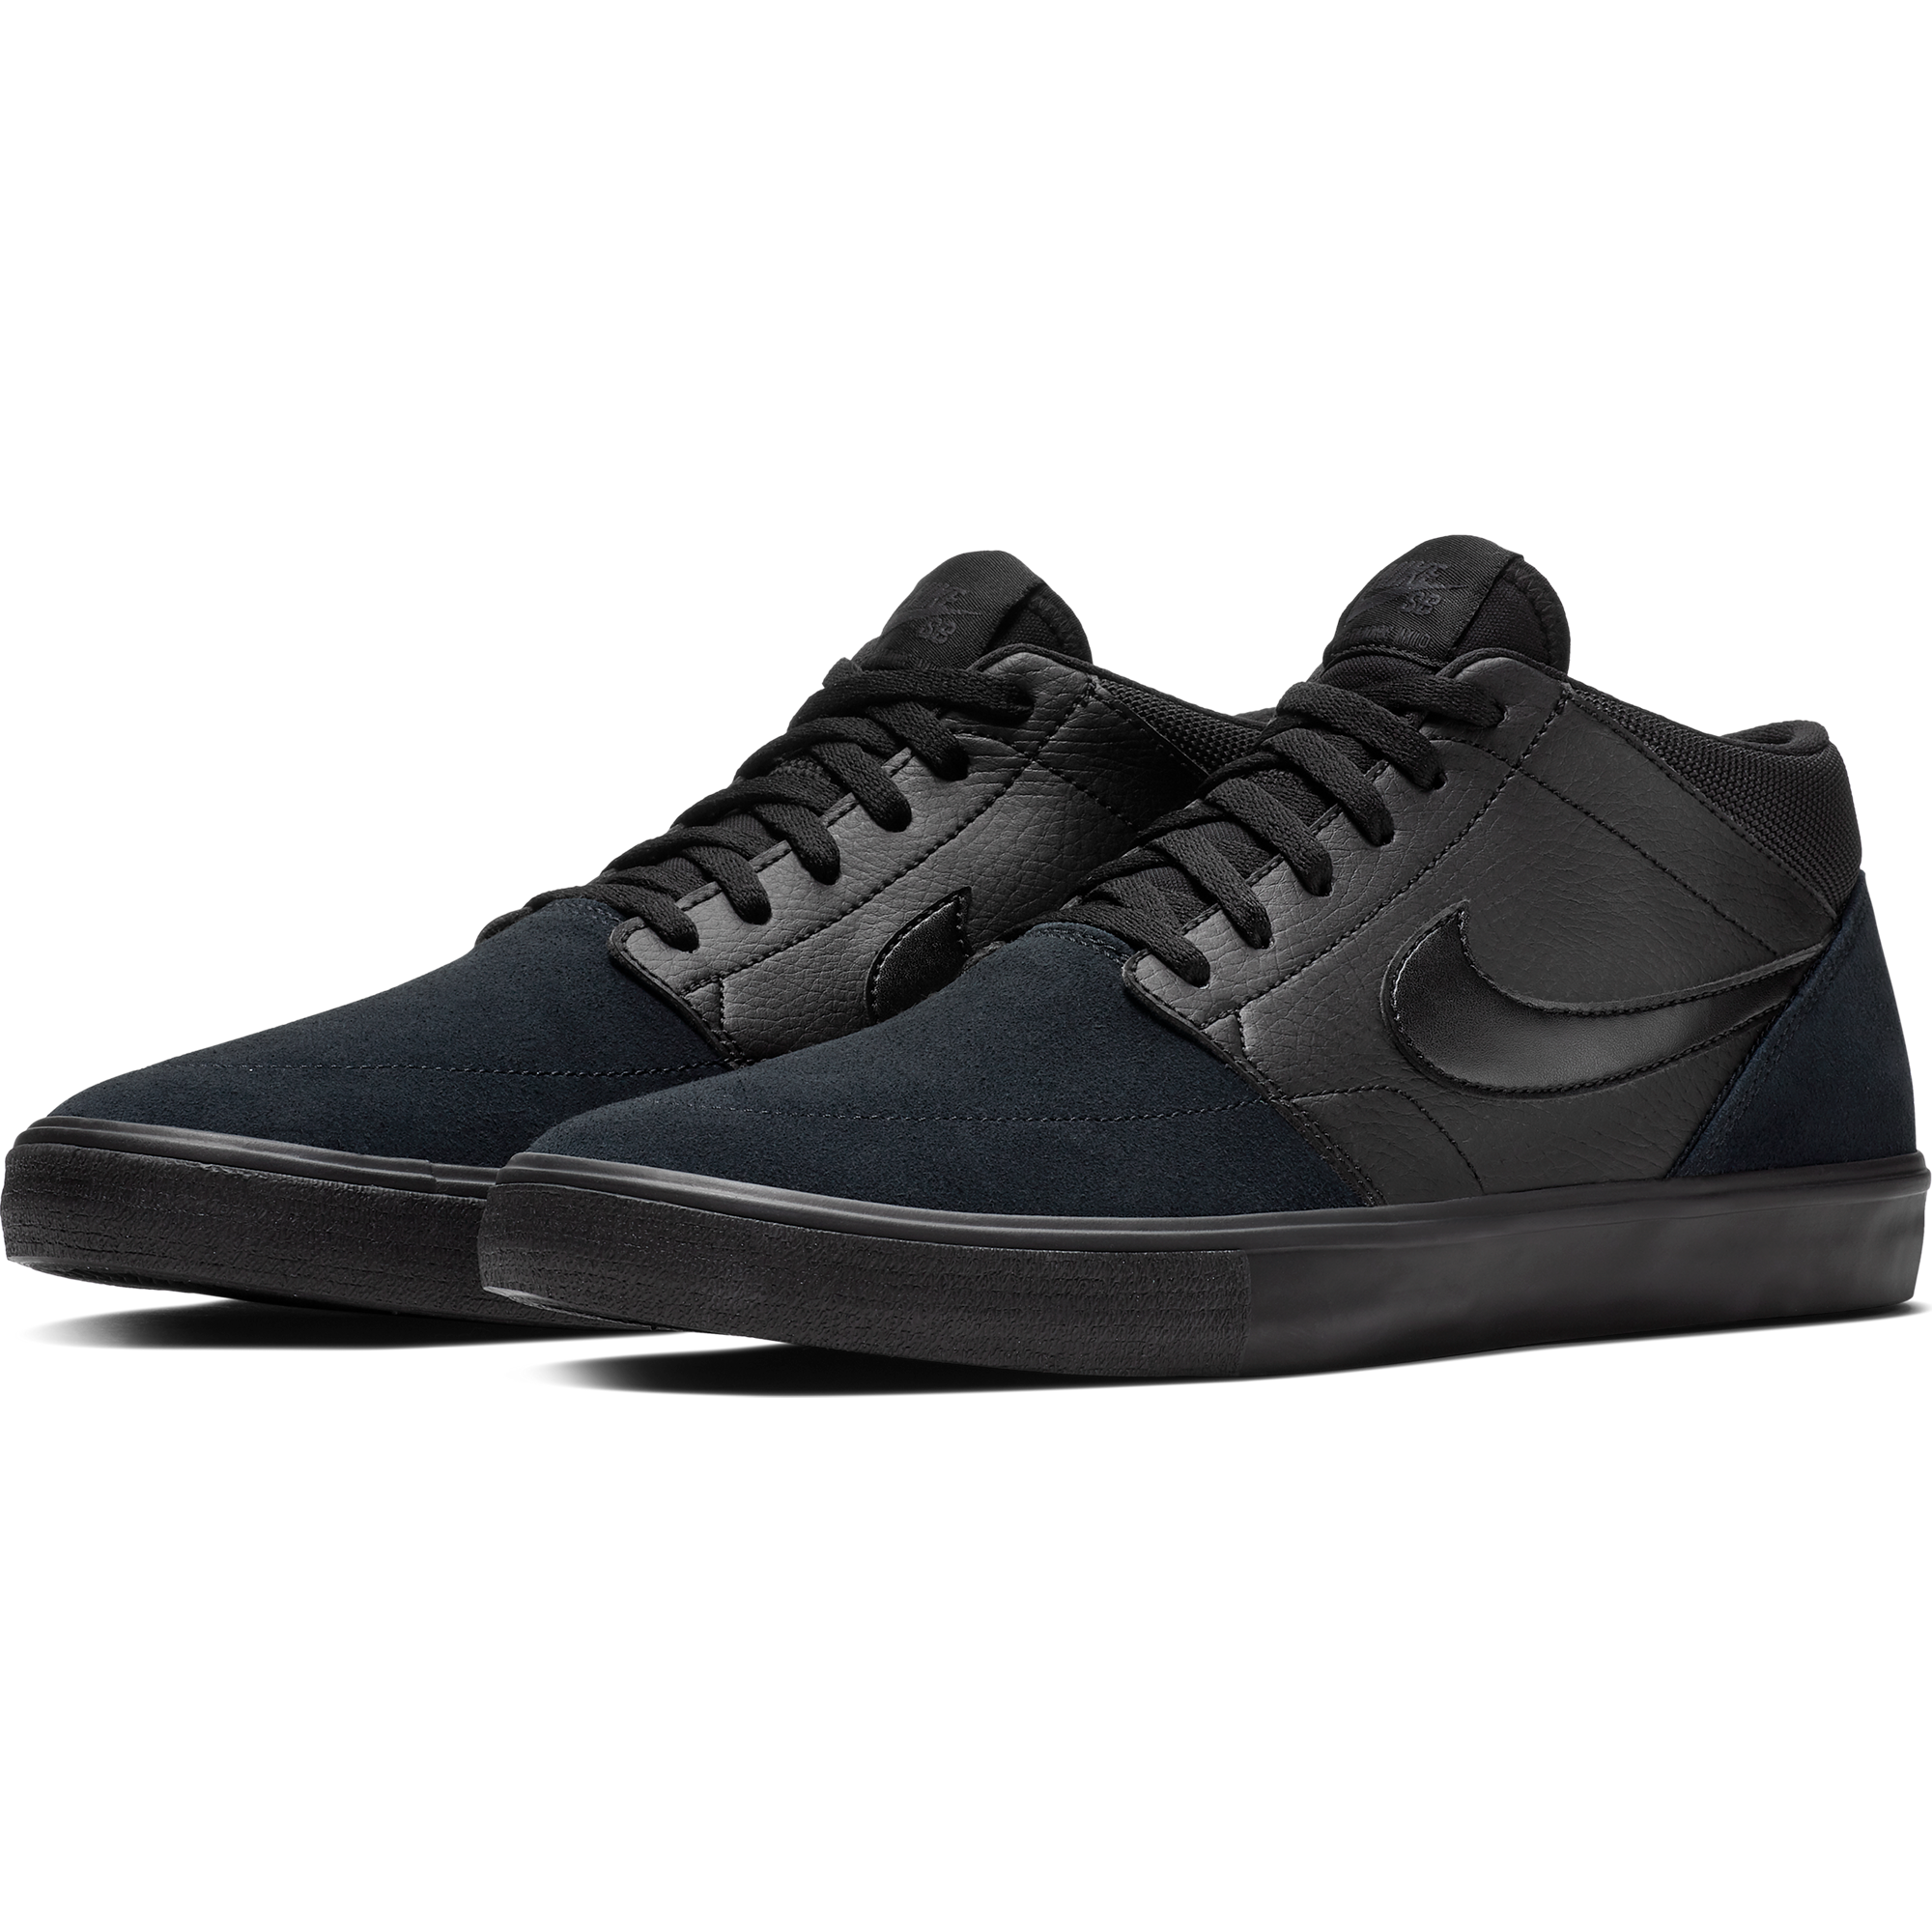 Nike SB Solarsoft Portmore II Mid - Black | Sneaks